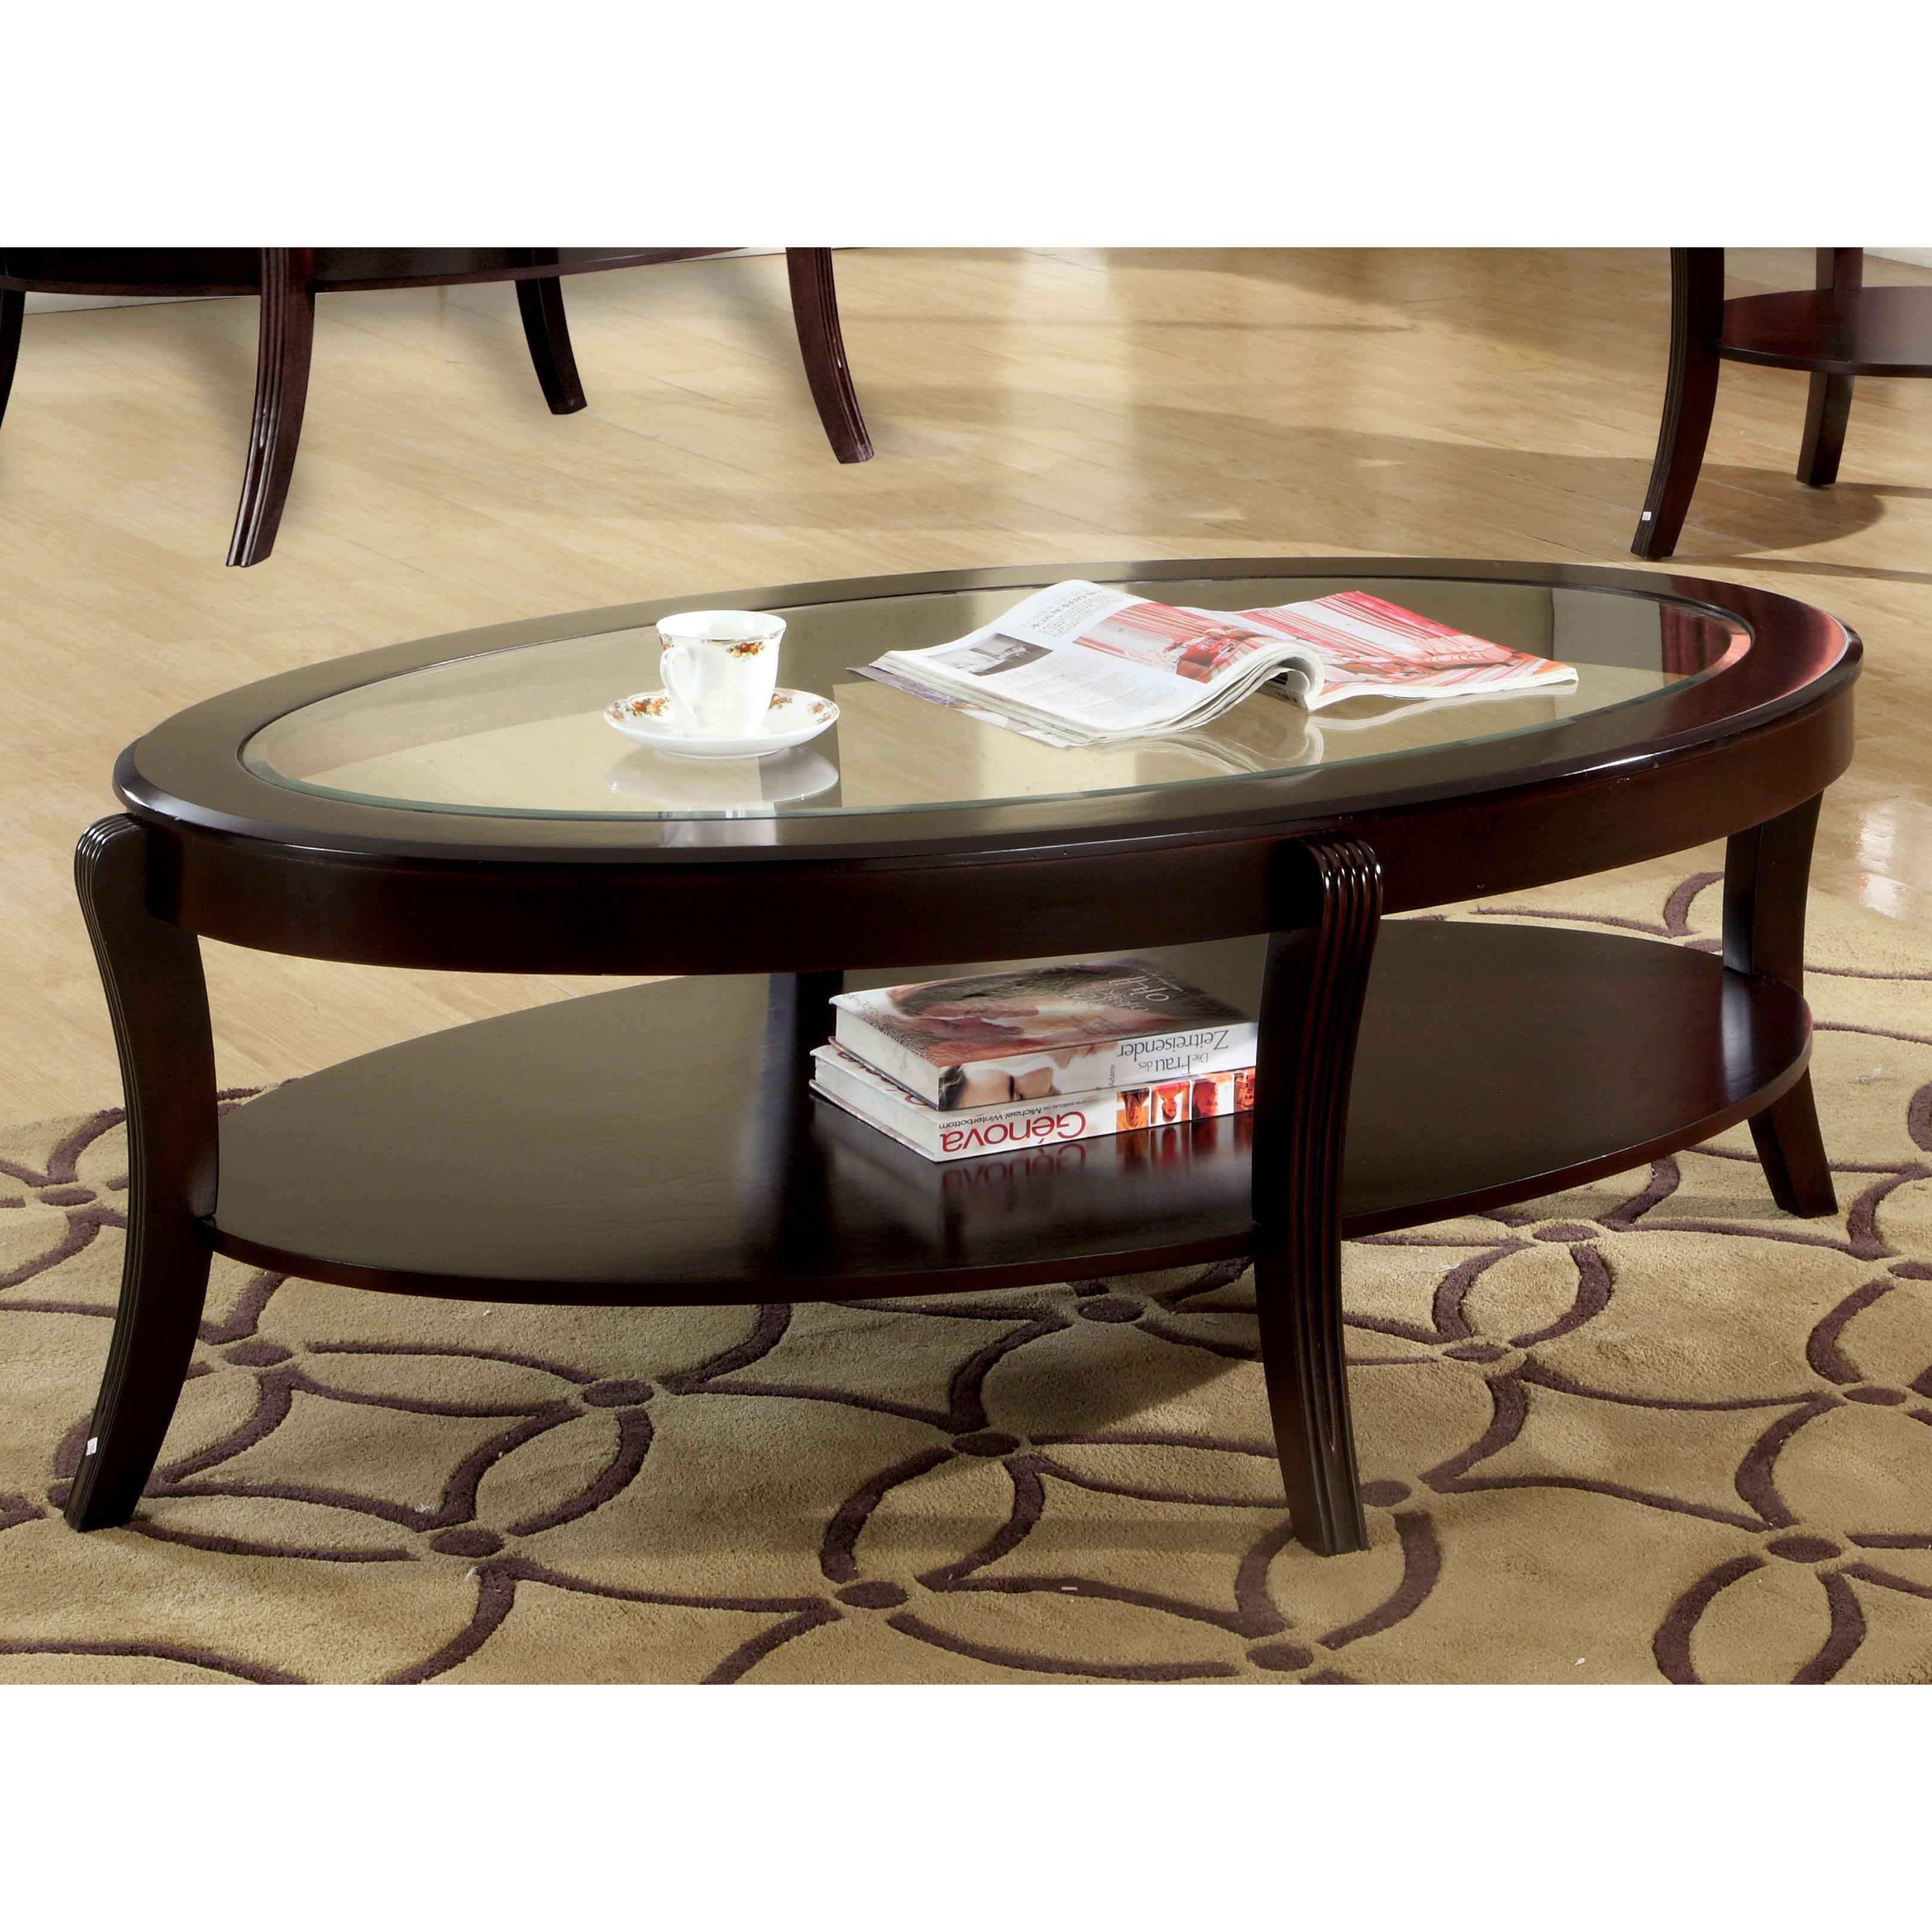 Furniture Of America Carline Modern Espresso Coffee Table With Regard To 2020 Evalline Modern Dark Walnut Coffee Tables (View 11 of 20)